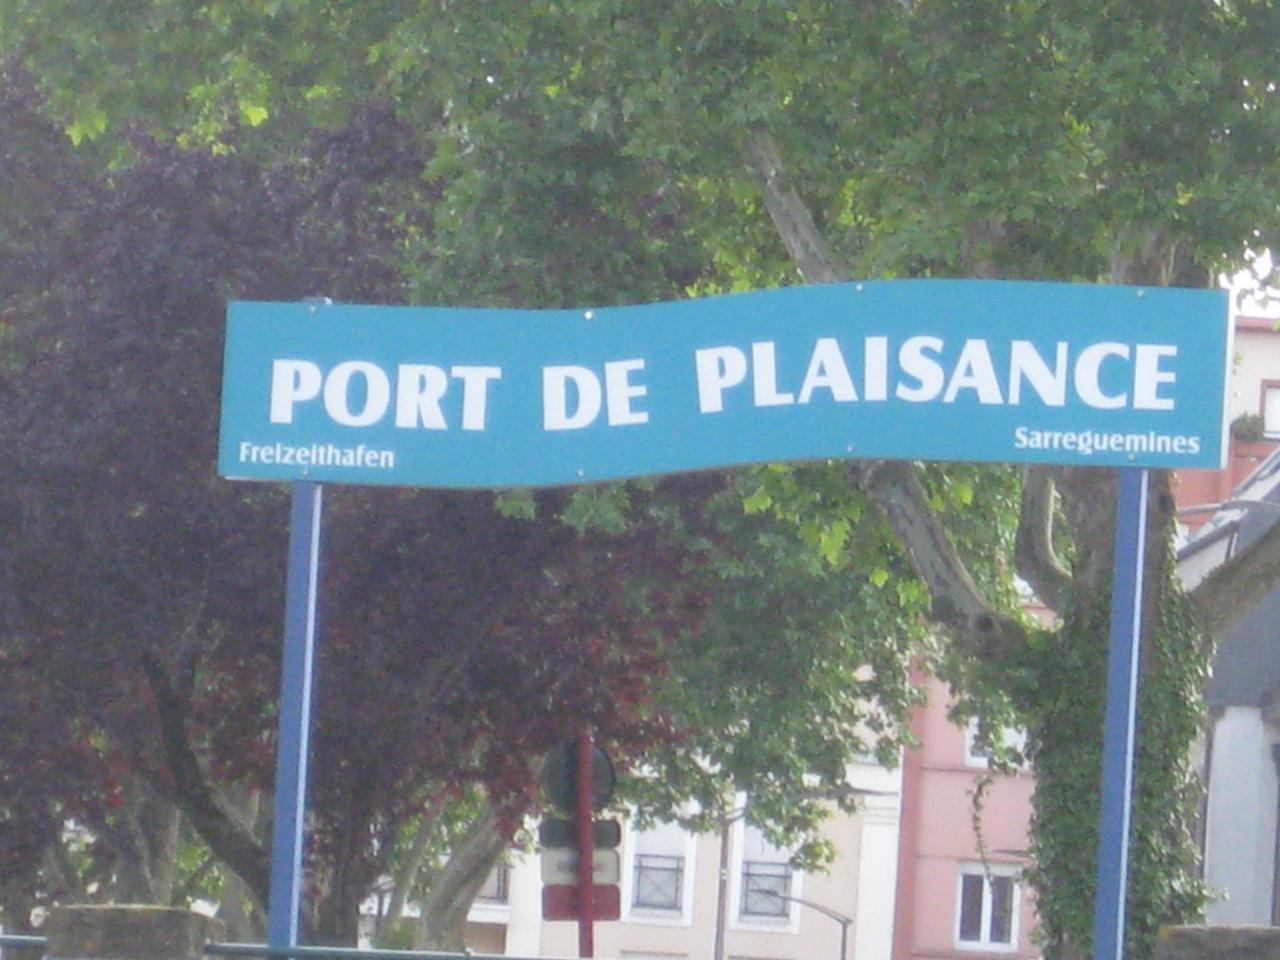 PORT DE PLAISANCE DE SARREGUEMINES